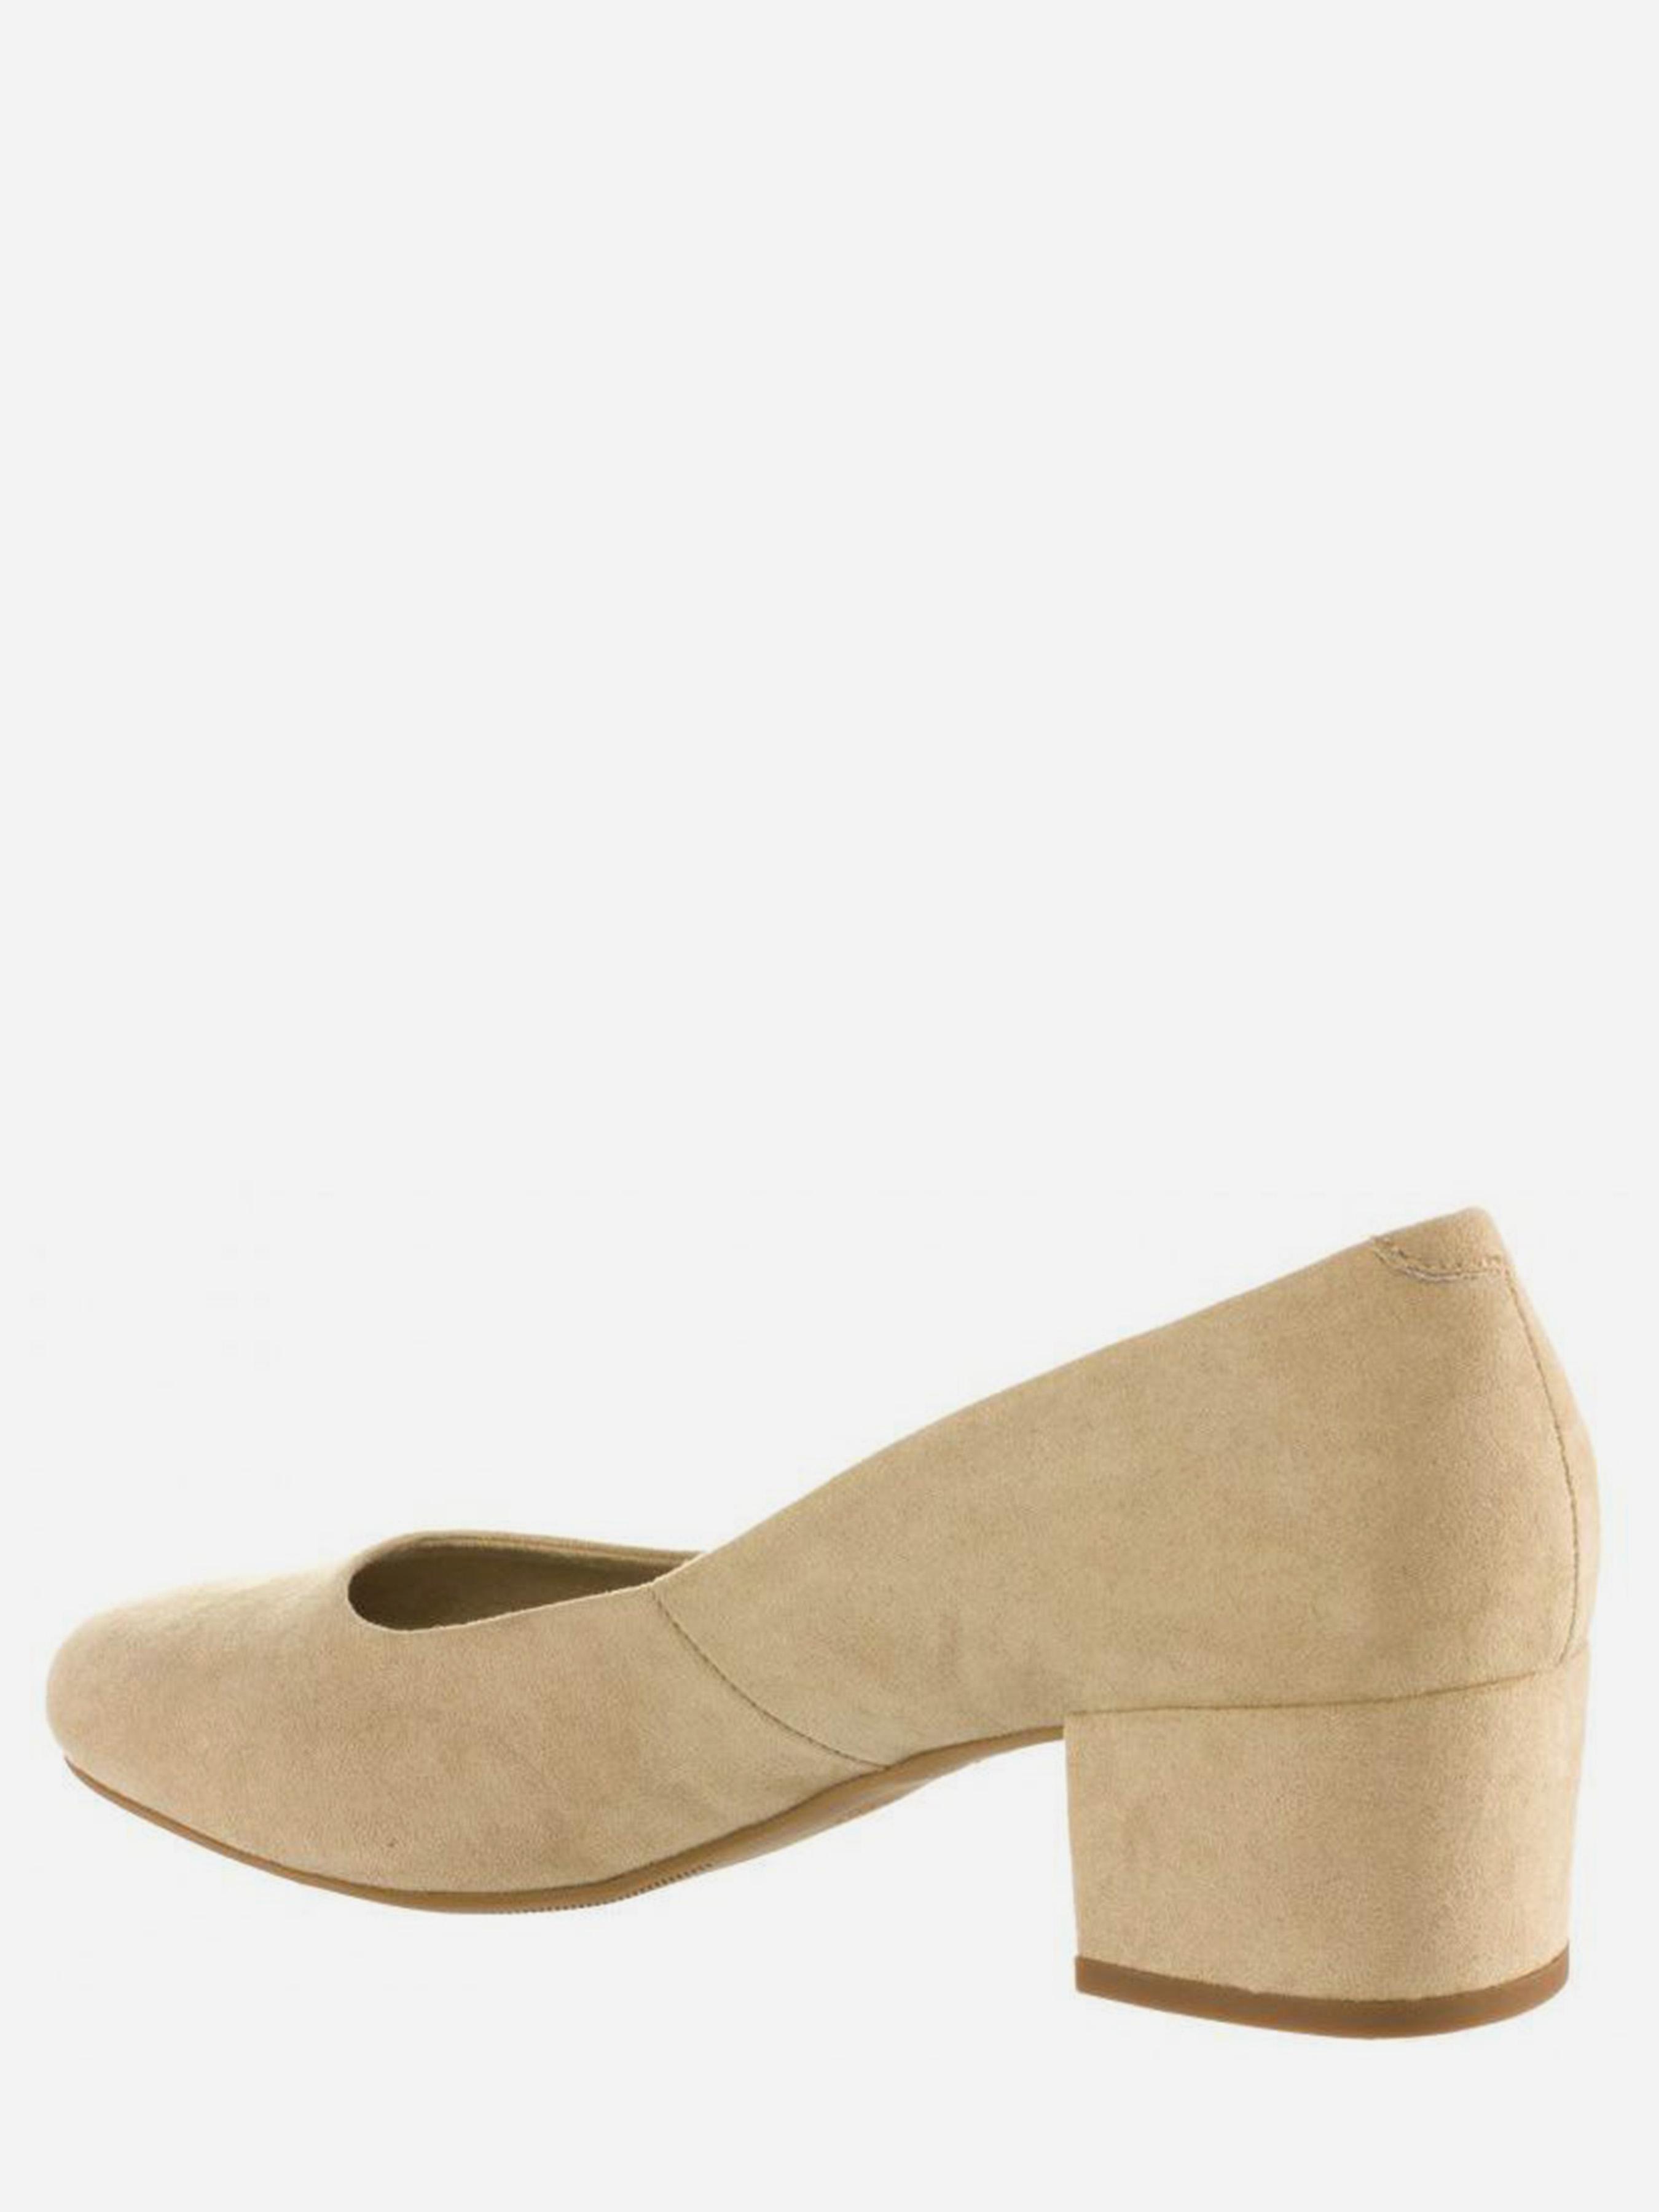 Туфли для женщин M Wone OI47 примерка, 2017